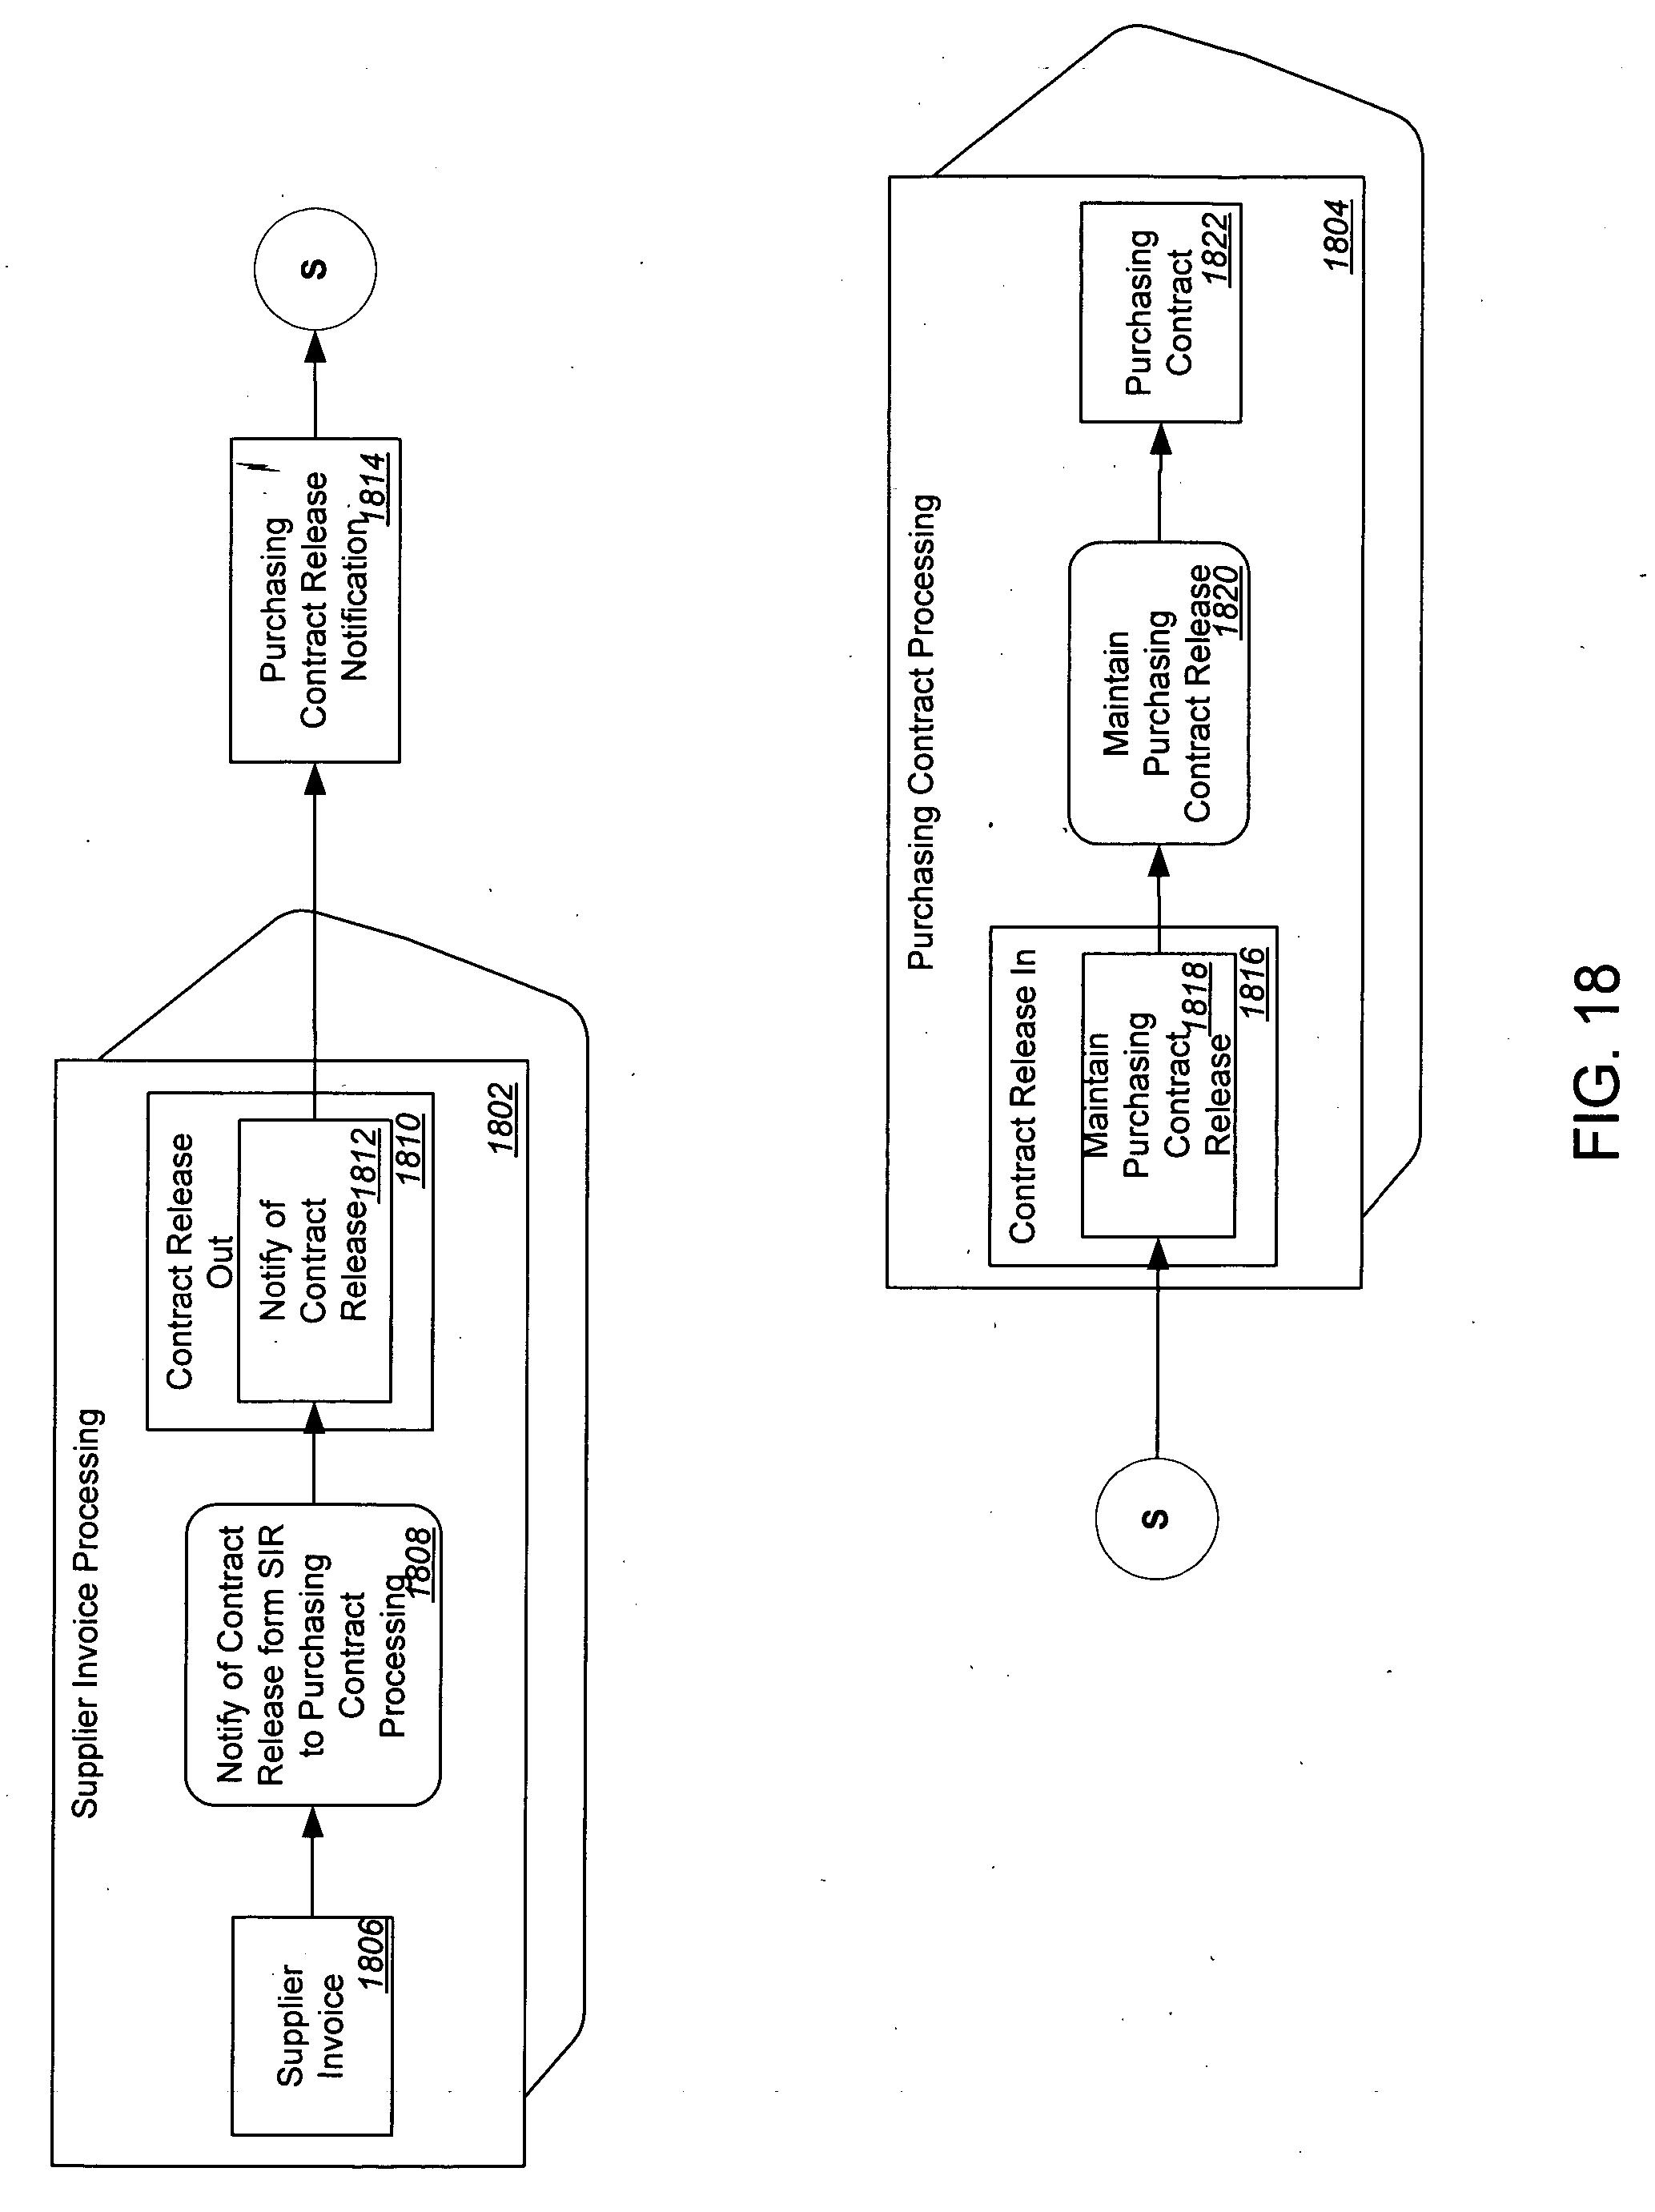 patent us20070156489 architectural design for service procurement